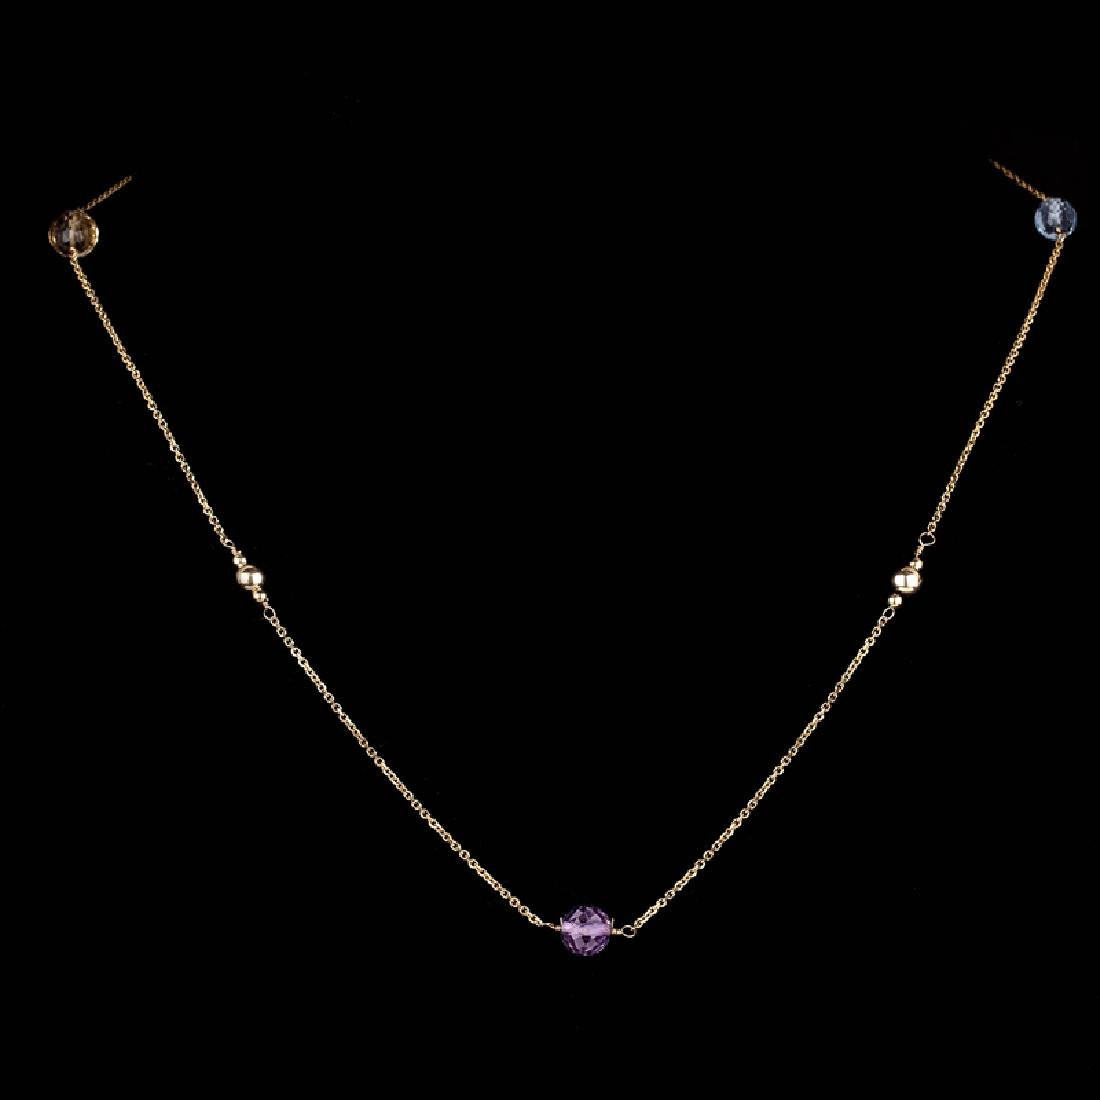 *14KT Gold, Diamond Cut, 2.7GR, 16'' Amethyst, Blue